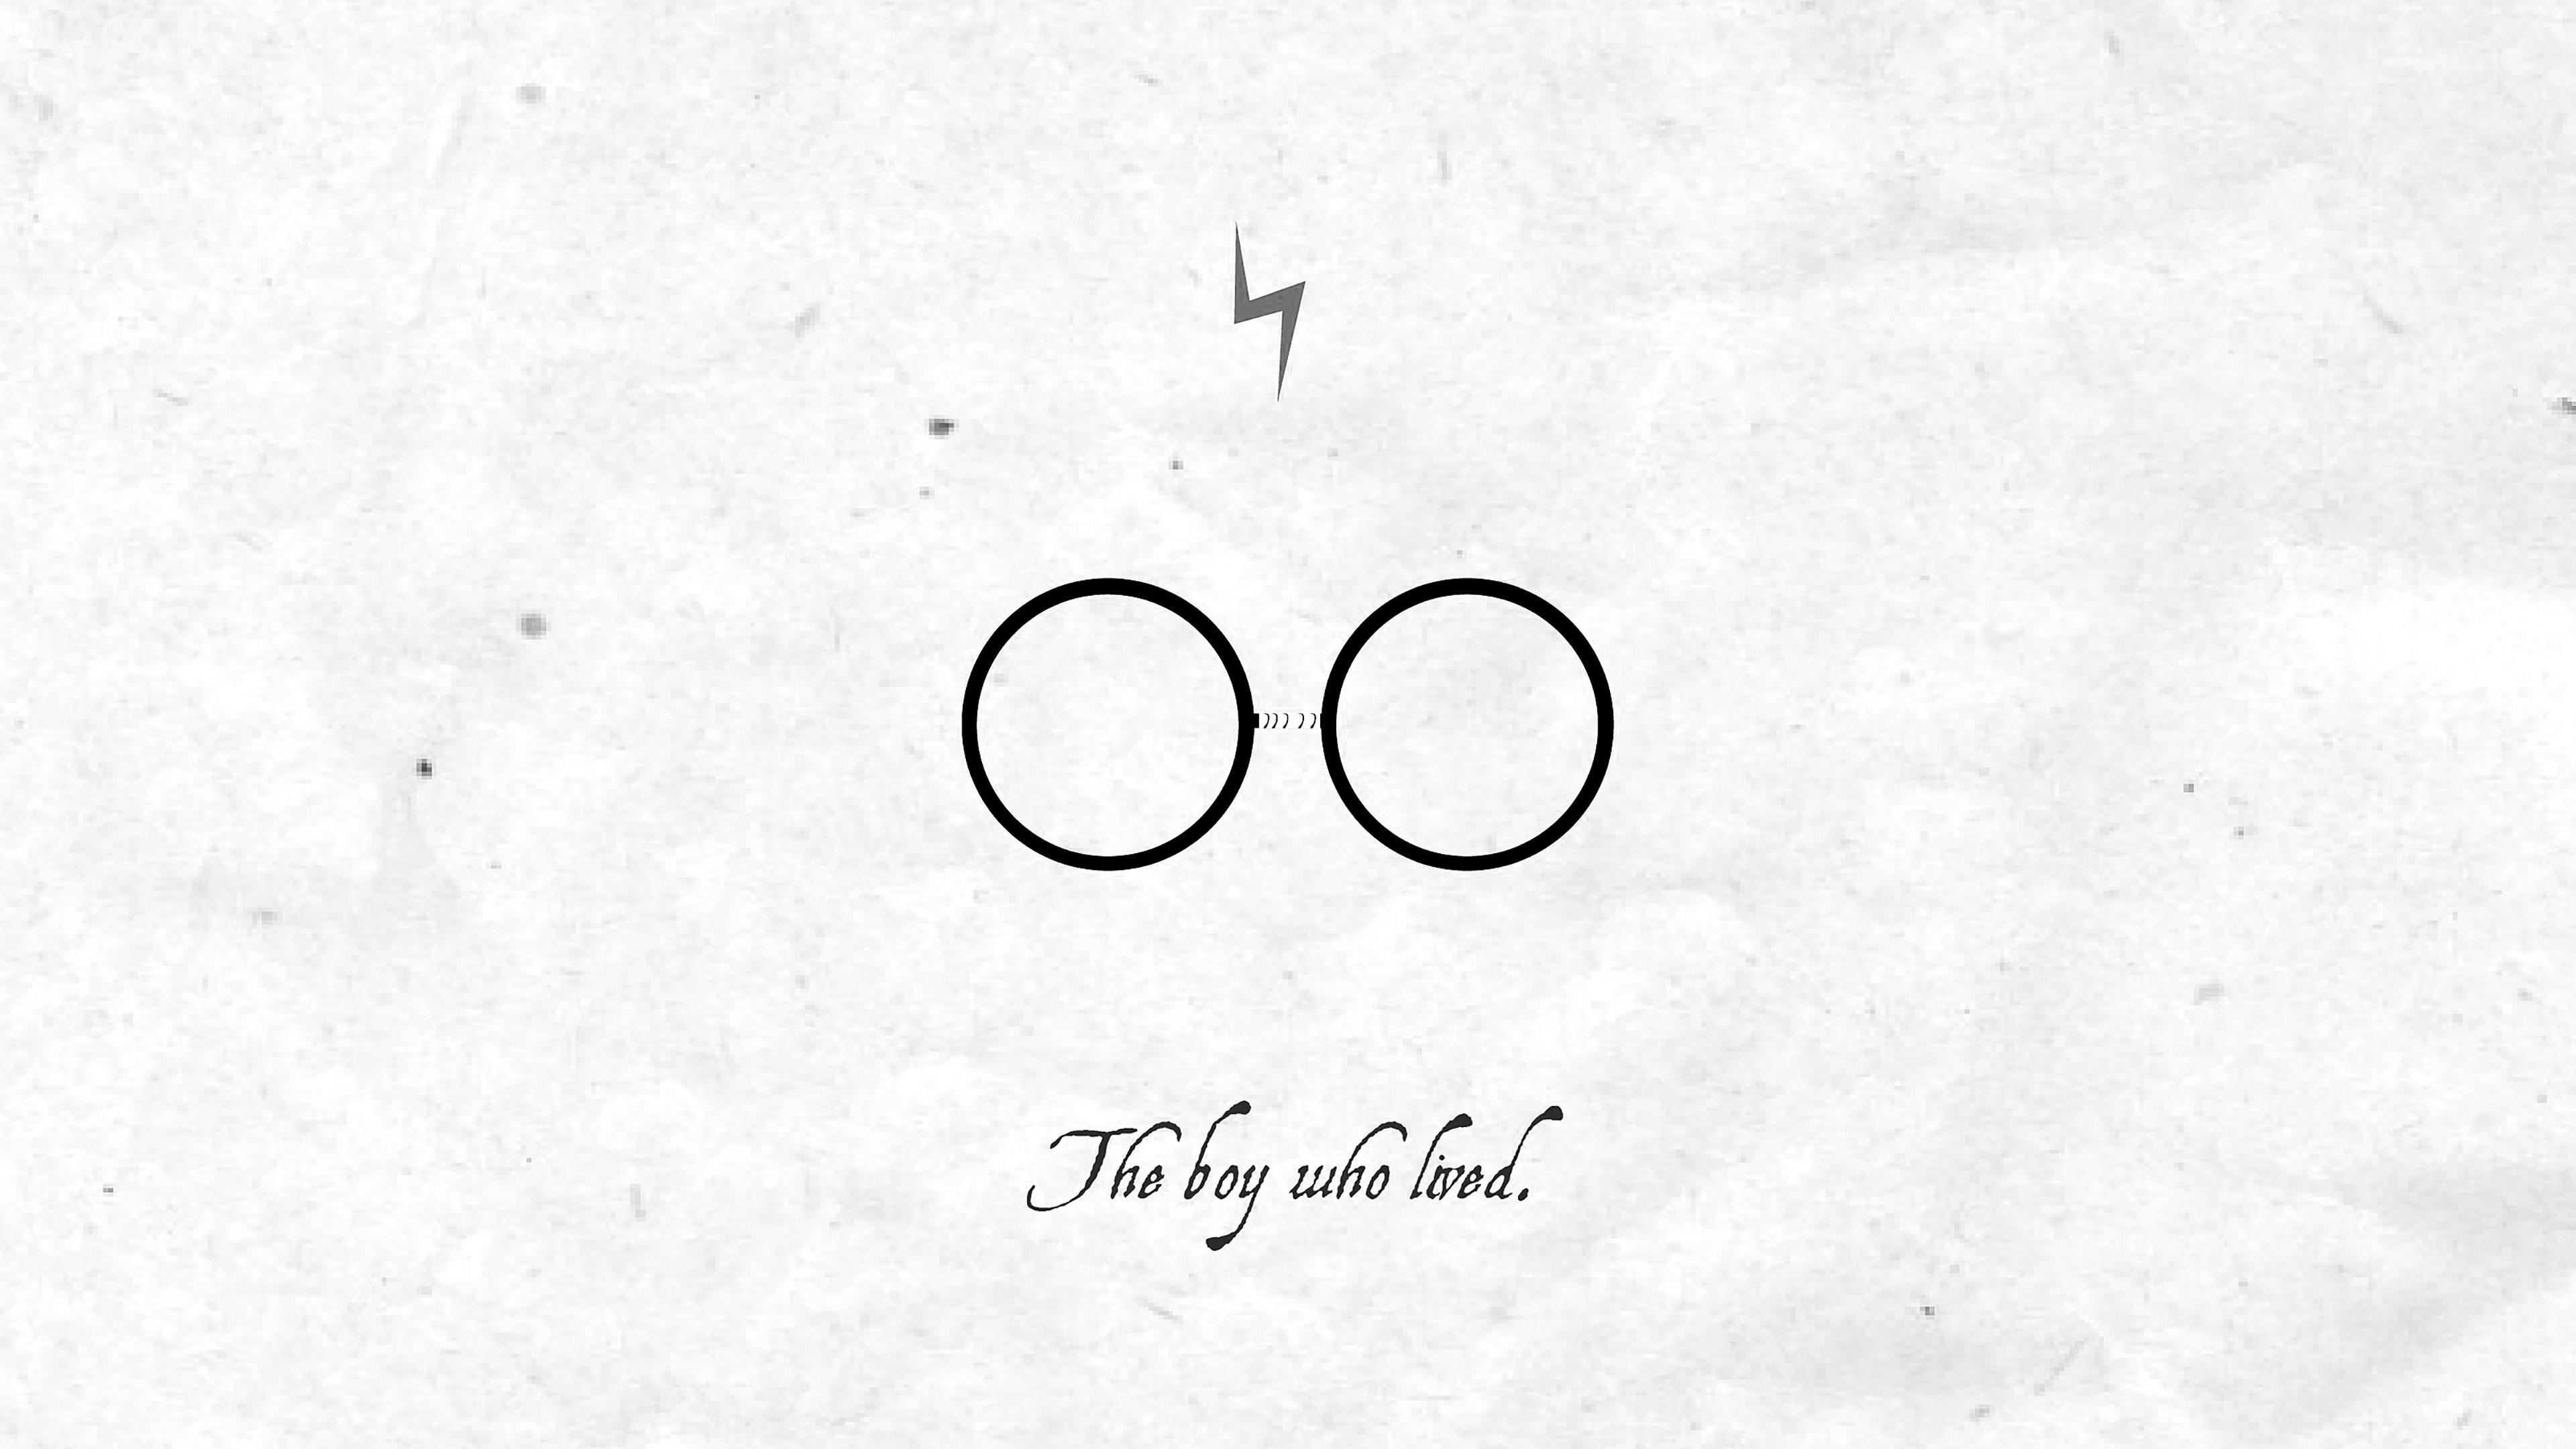 Popular Wallpaper Harry Potter Tablet - papers  Image_592940.jpg